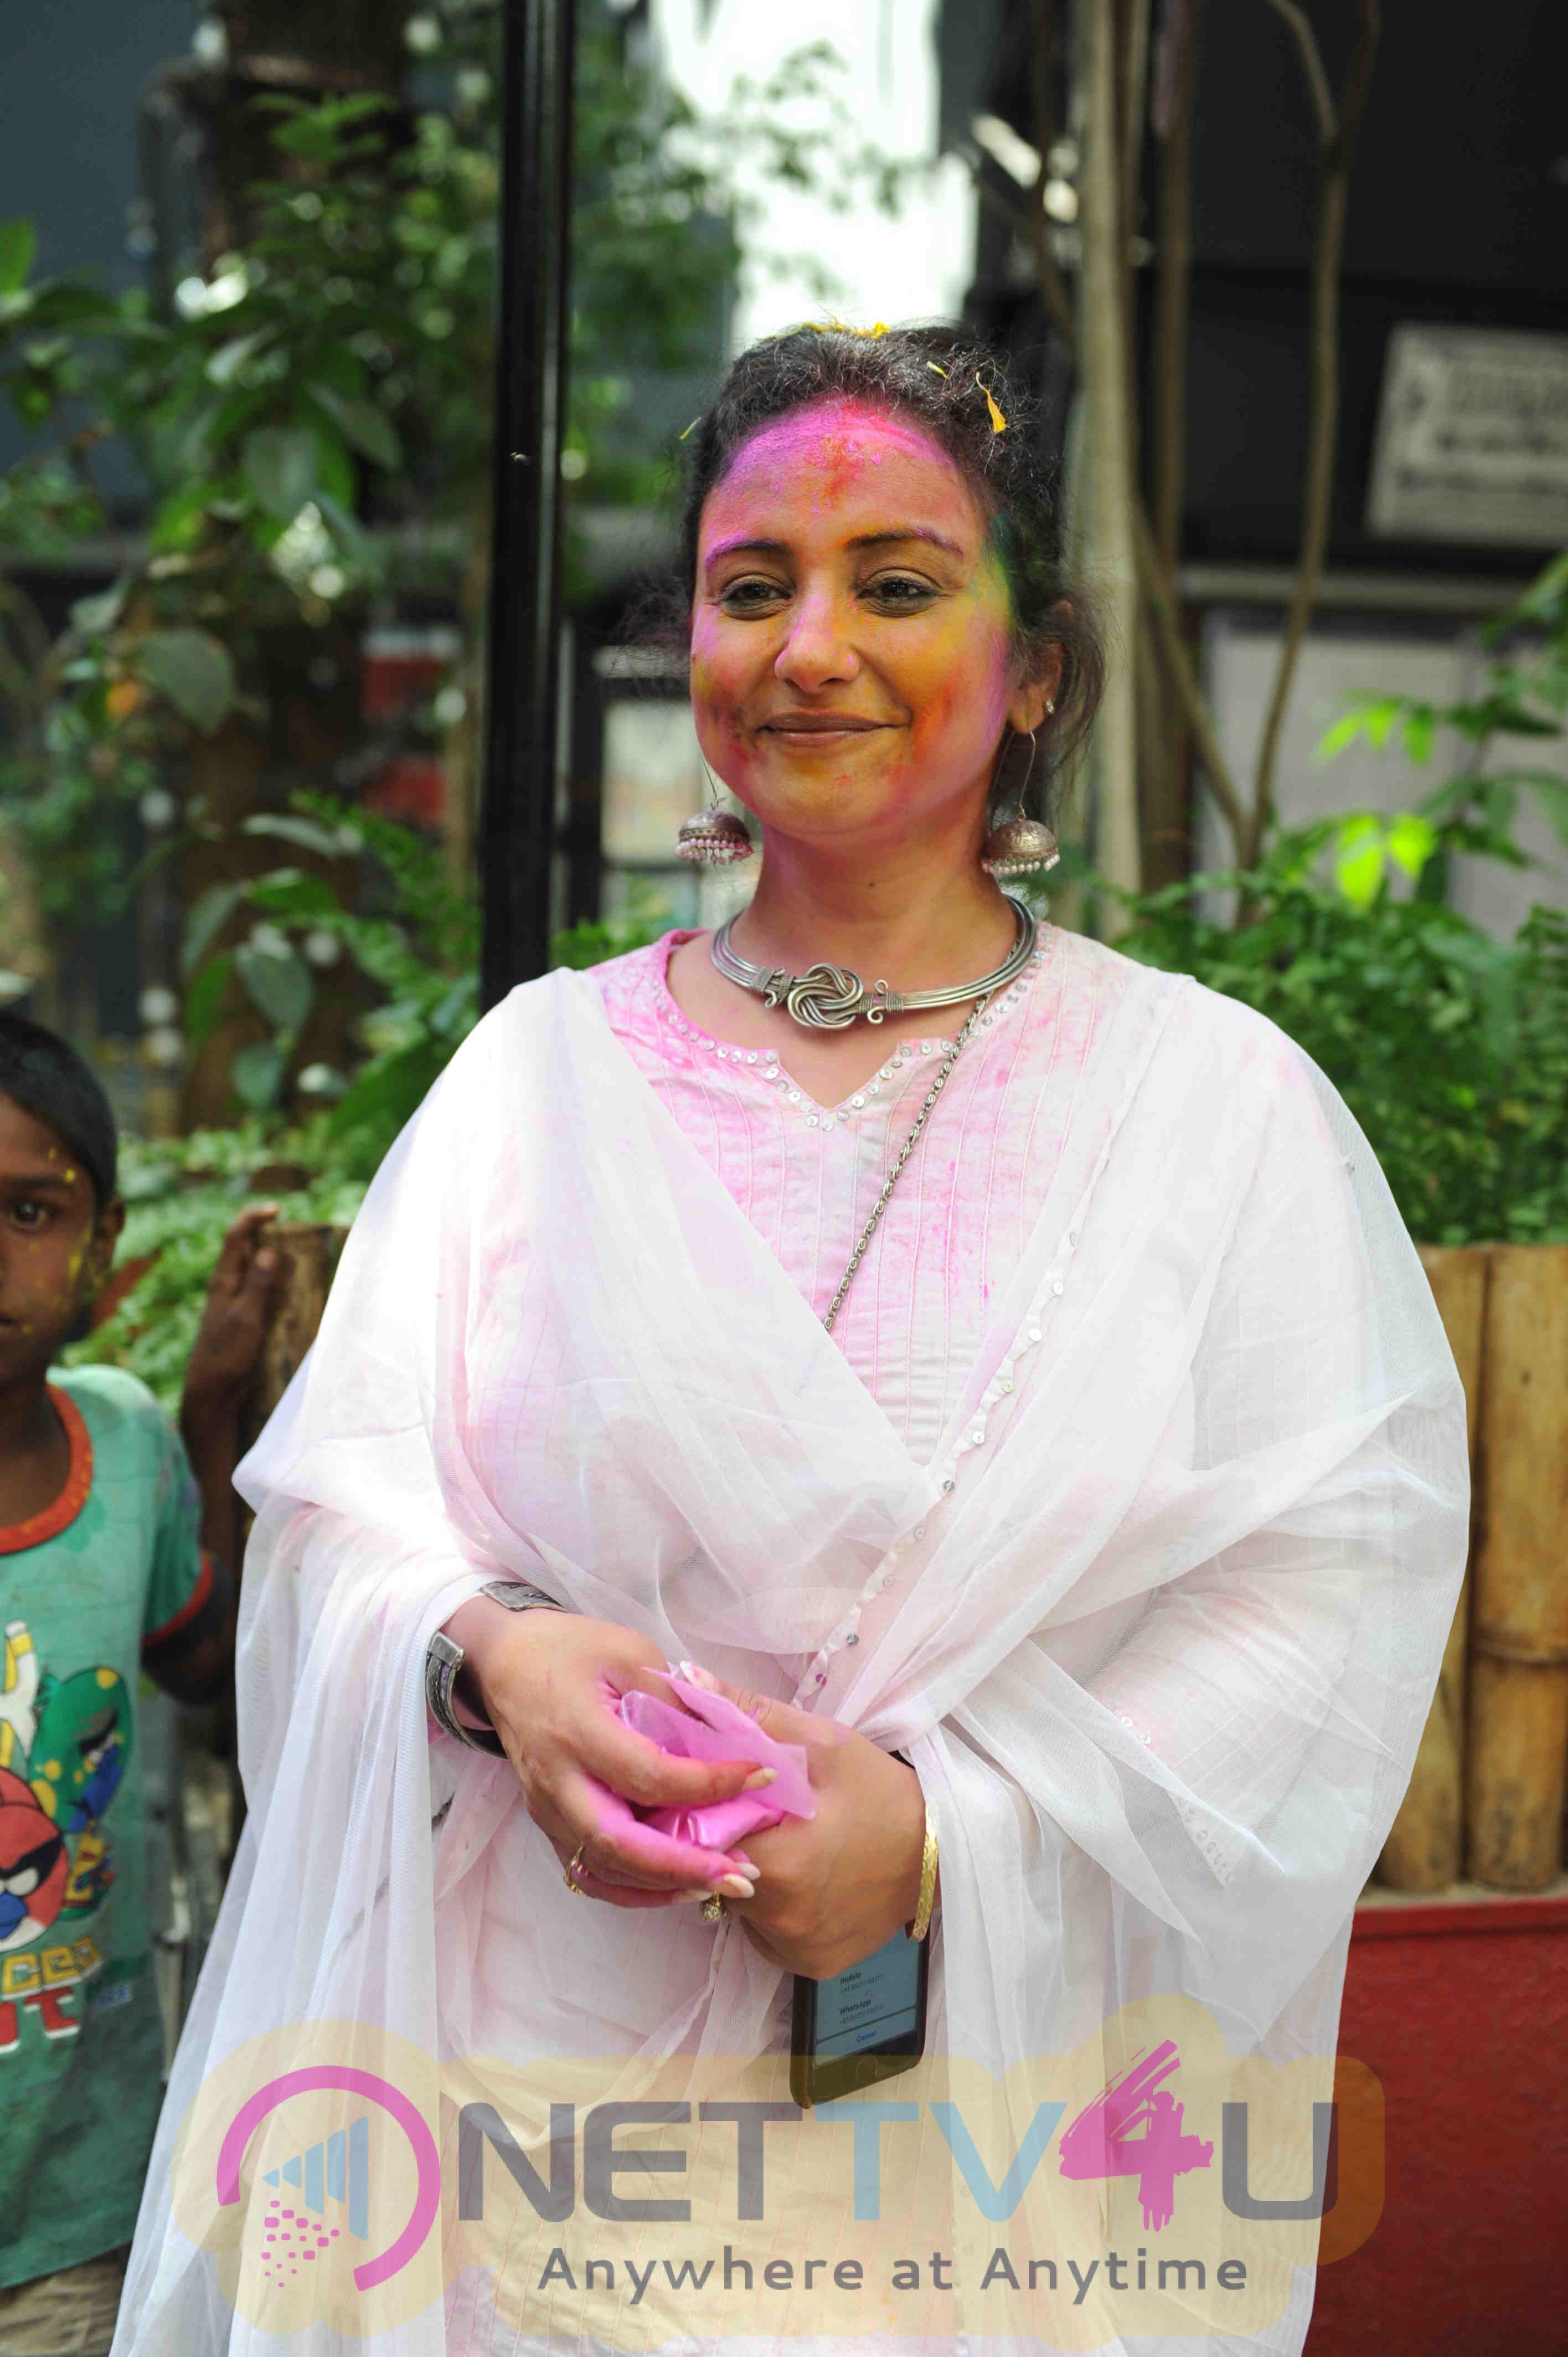 Bollywood Celebrities Holi 2017 Celebrations Photos